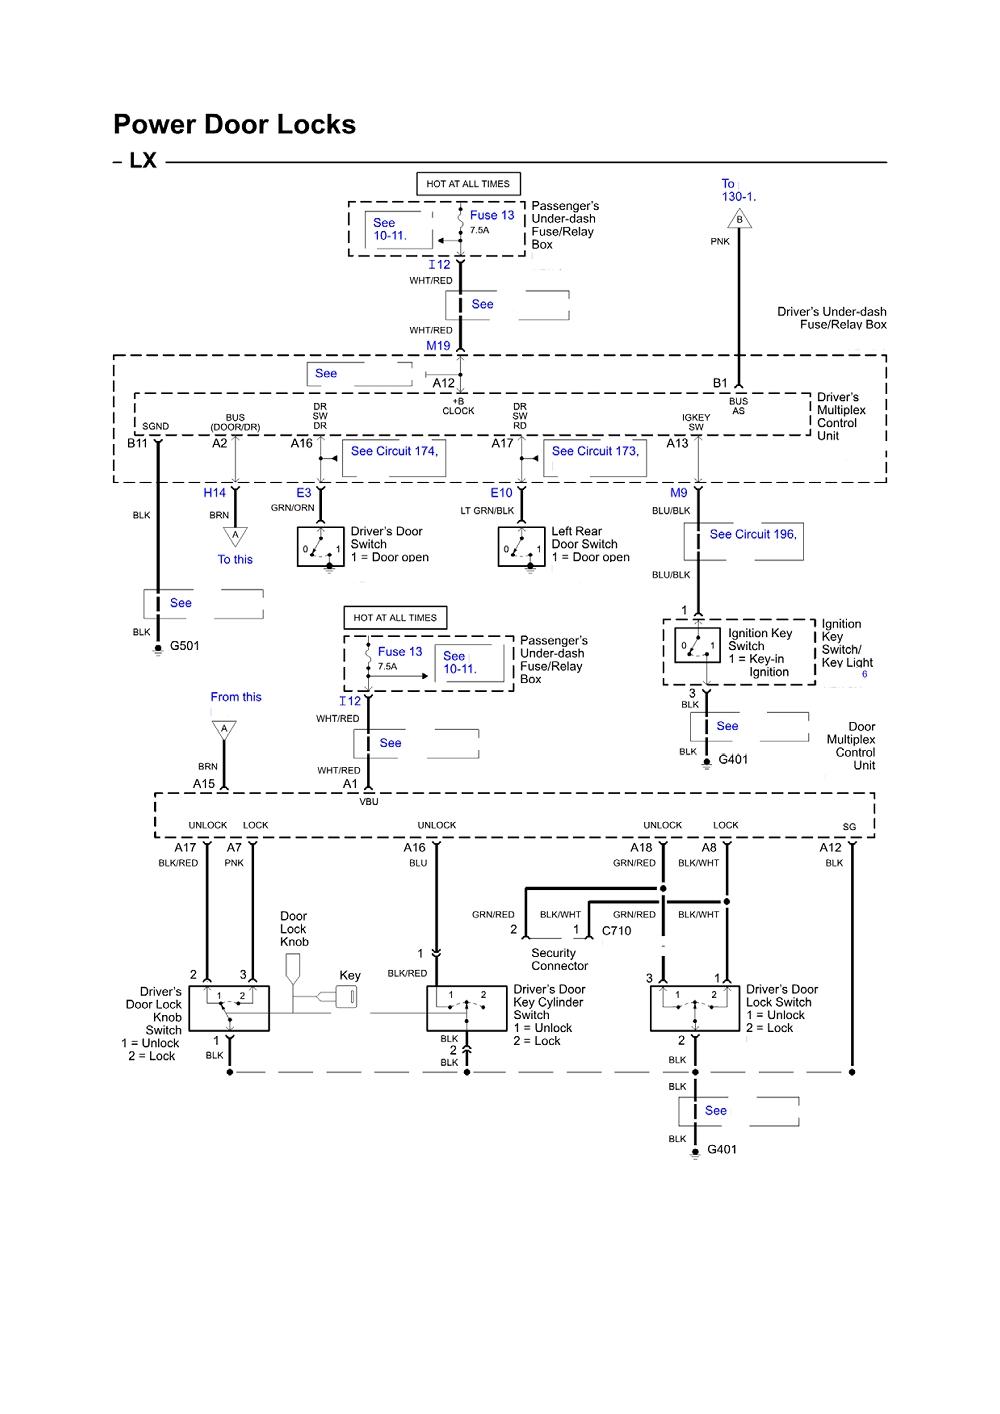 locknetics wiring diagram wiring diagram tutorial Panasonic Wiring Diagram locknetics ct 1000 wiring diagram wiring diagram librarylocknetics wiring diagram the portal and forum of wiring